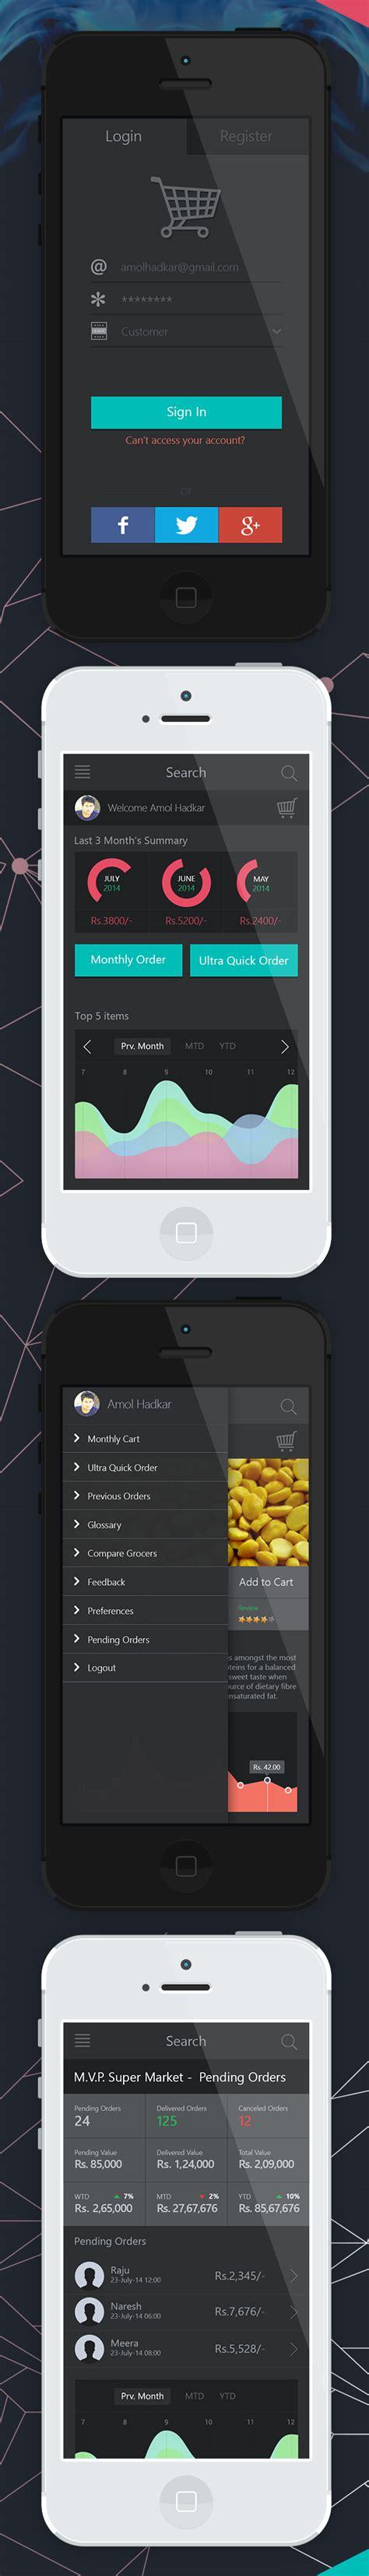 design help fresh 6 interior design apps fer help with a swipe graphic design website milton keynes visual identity vi